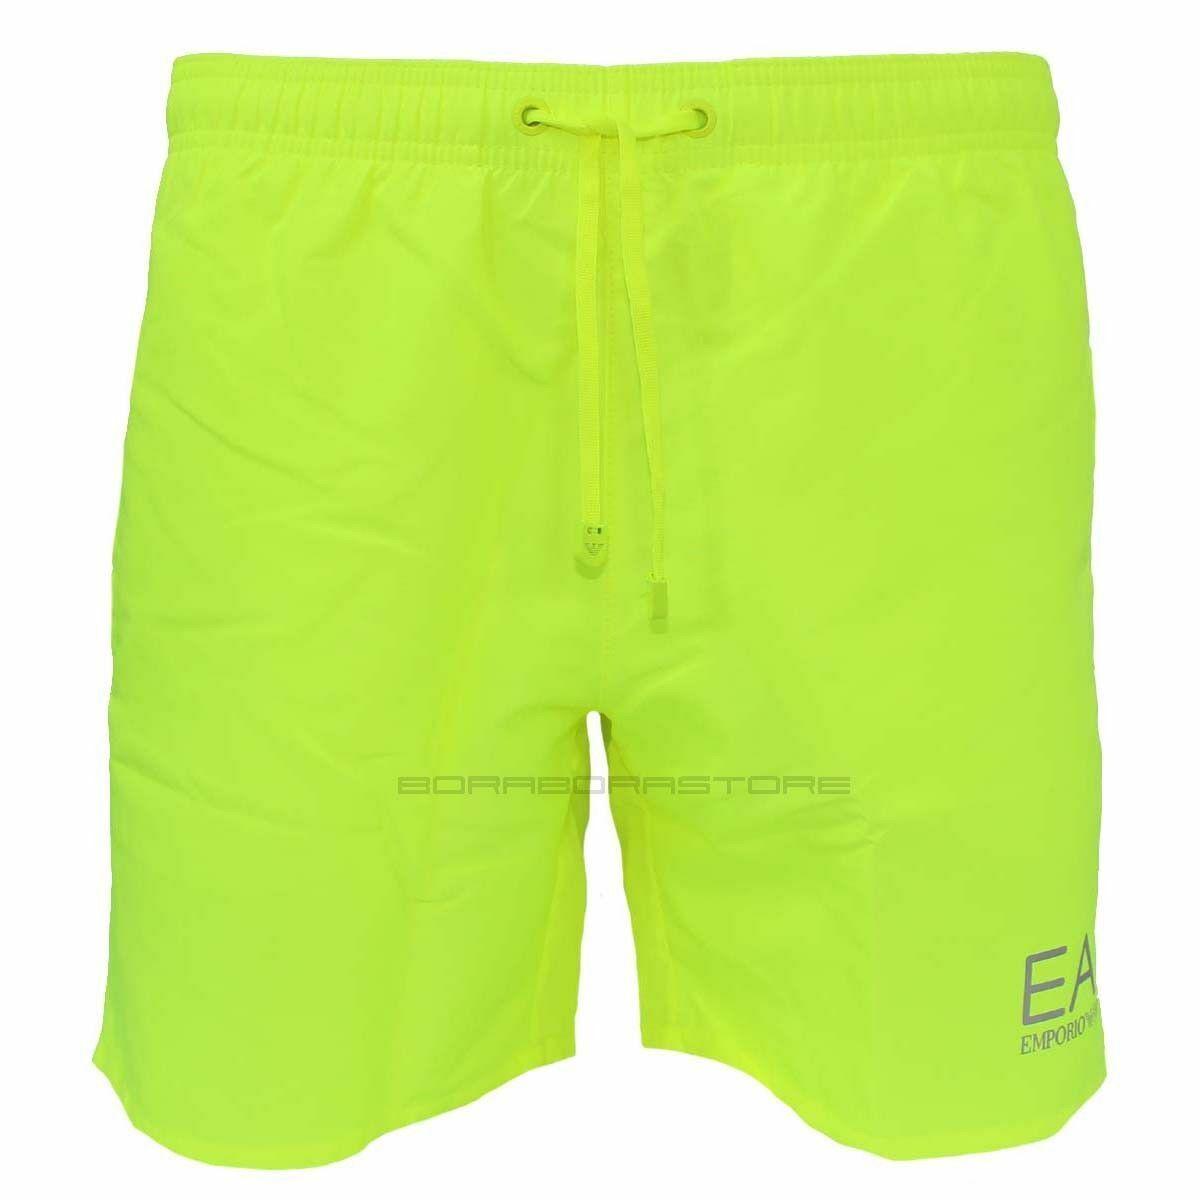 Emporio Armani EA7 Herren Badeshorts Badehose 902000  cc721 fluo yellow